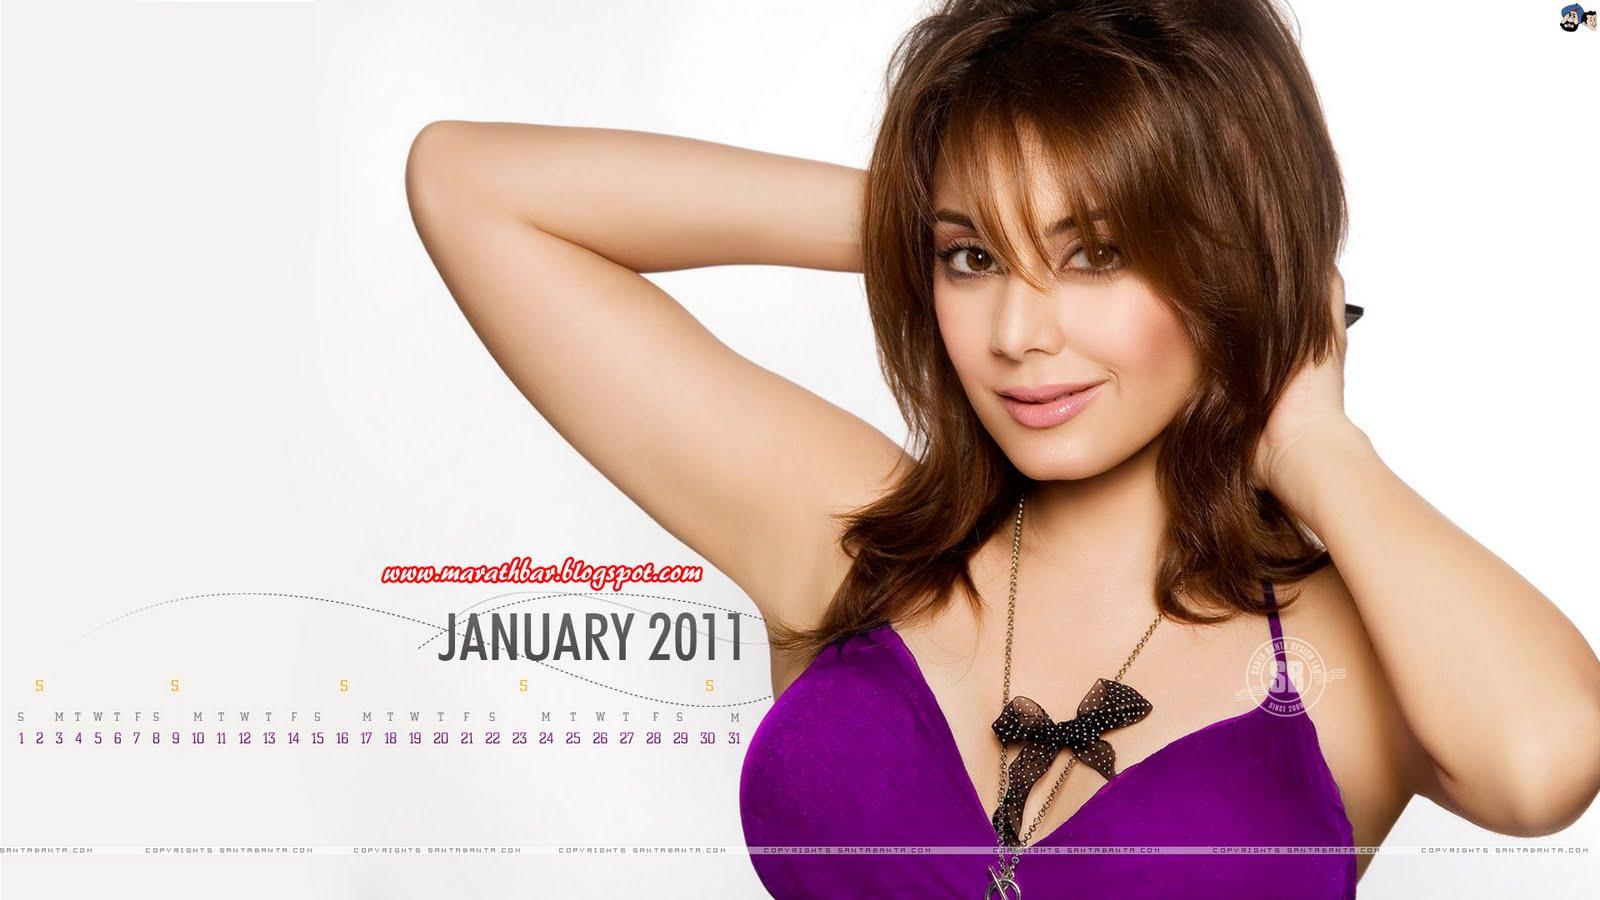 santa banta bollywood calendar 2011 wallpapers for desktop